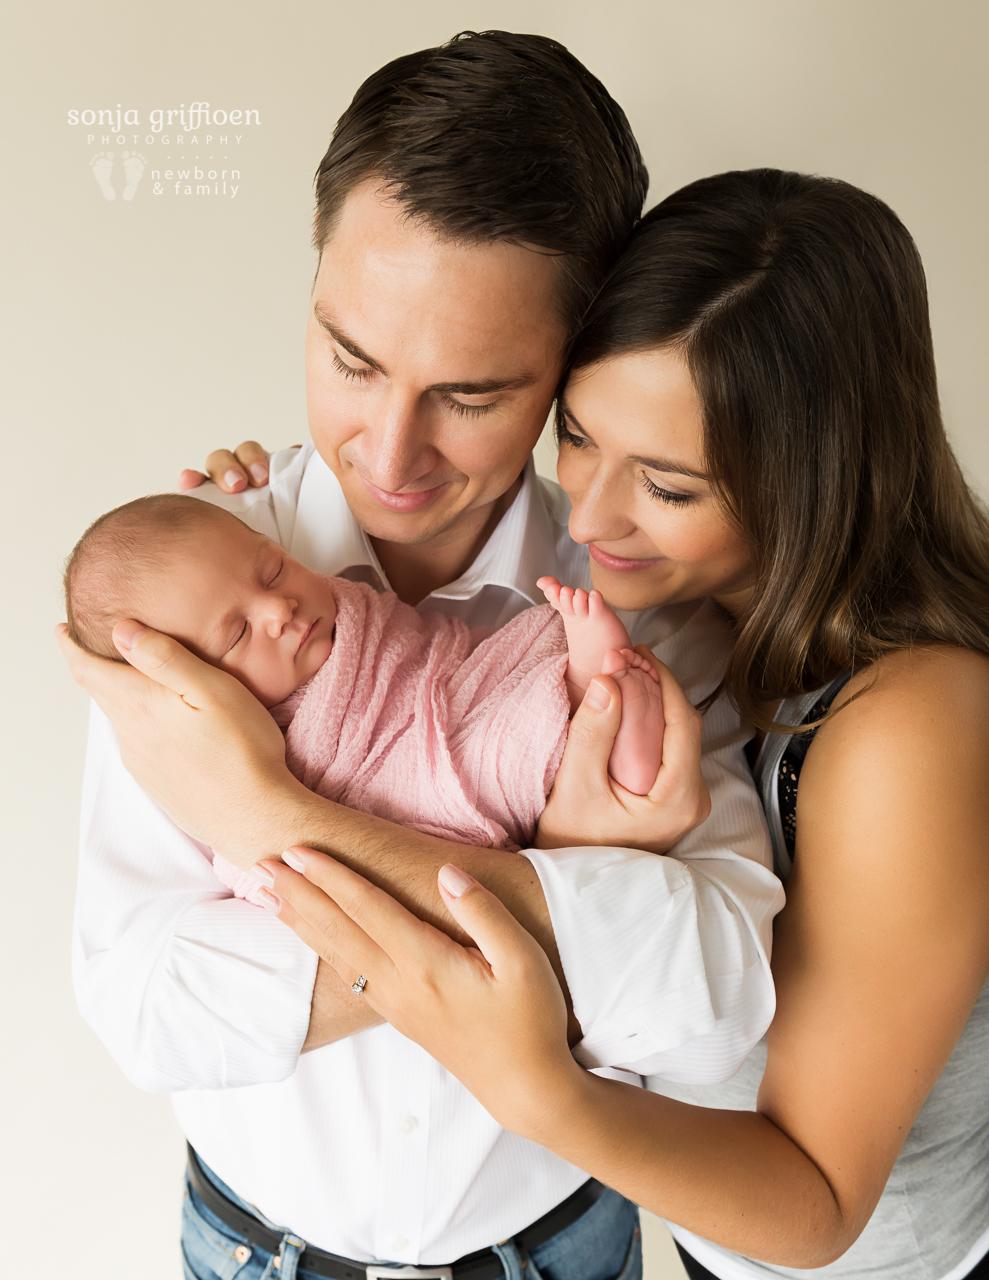 Thalia-Newborn-Brisbane-Newborn-Photographer-Sonja-Griffioen-42.jpg